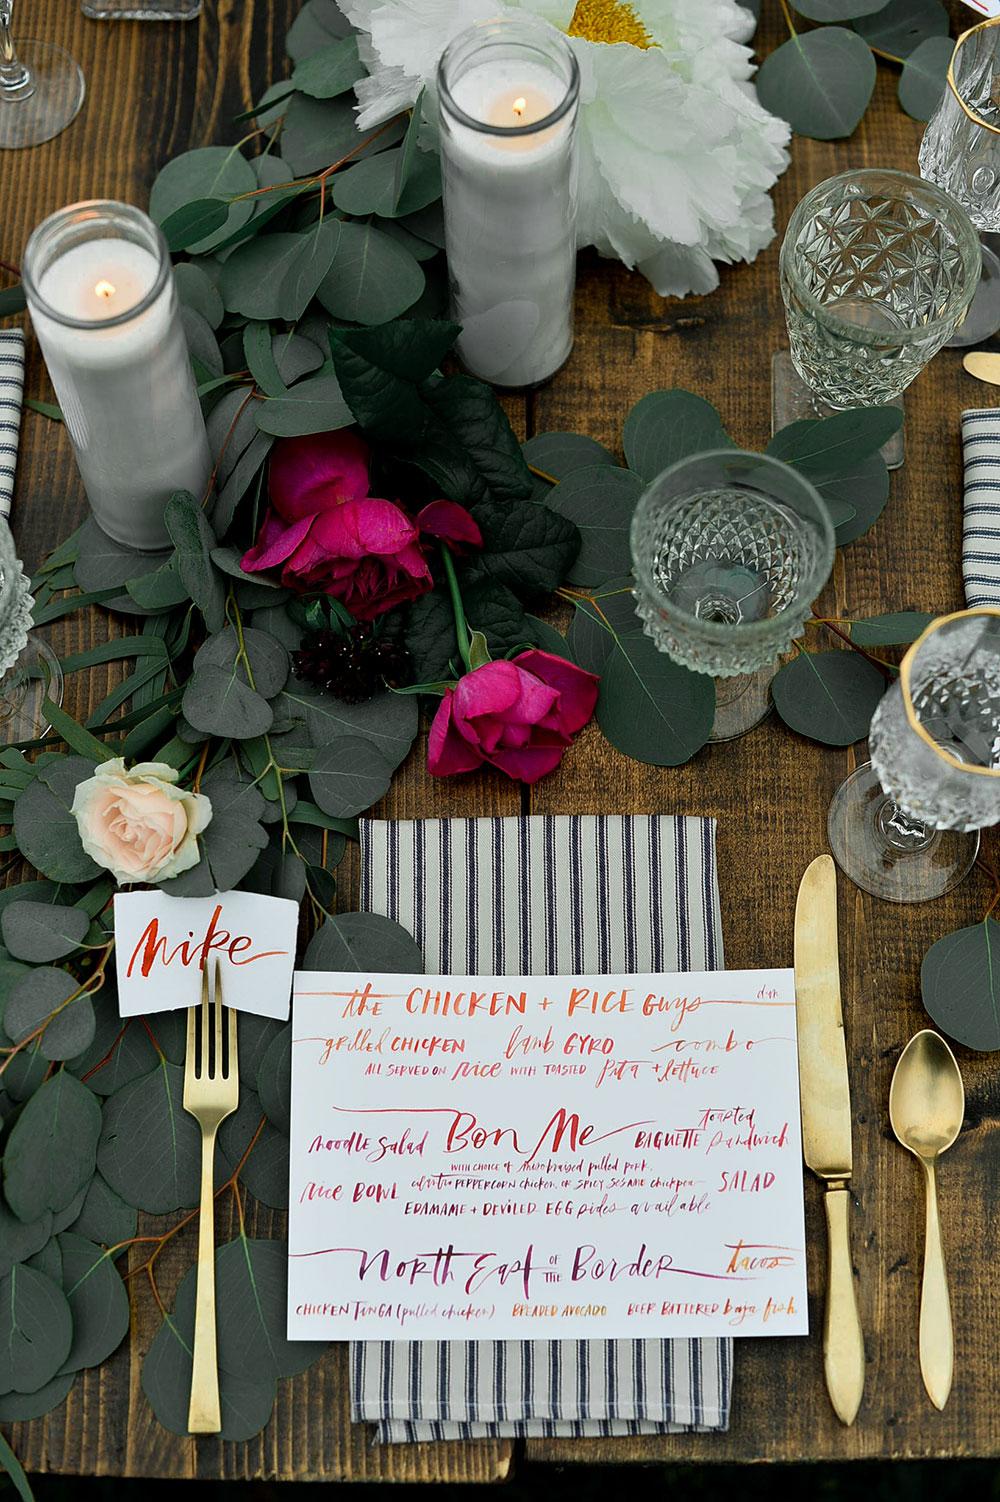 OUTDOOR ESTATE WEDDING by Boston based designer mStarr design